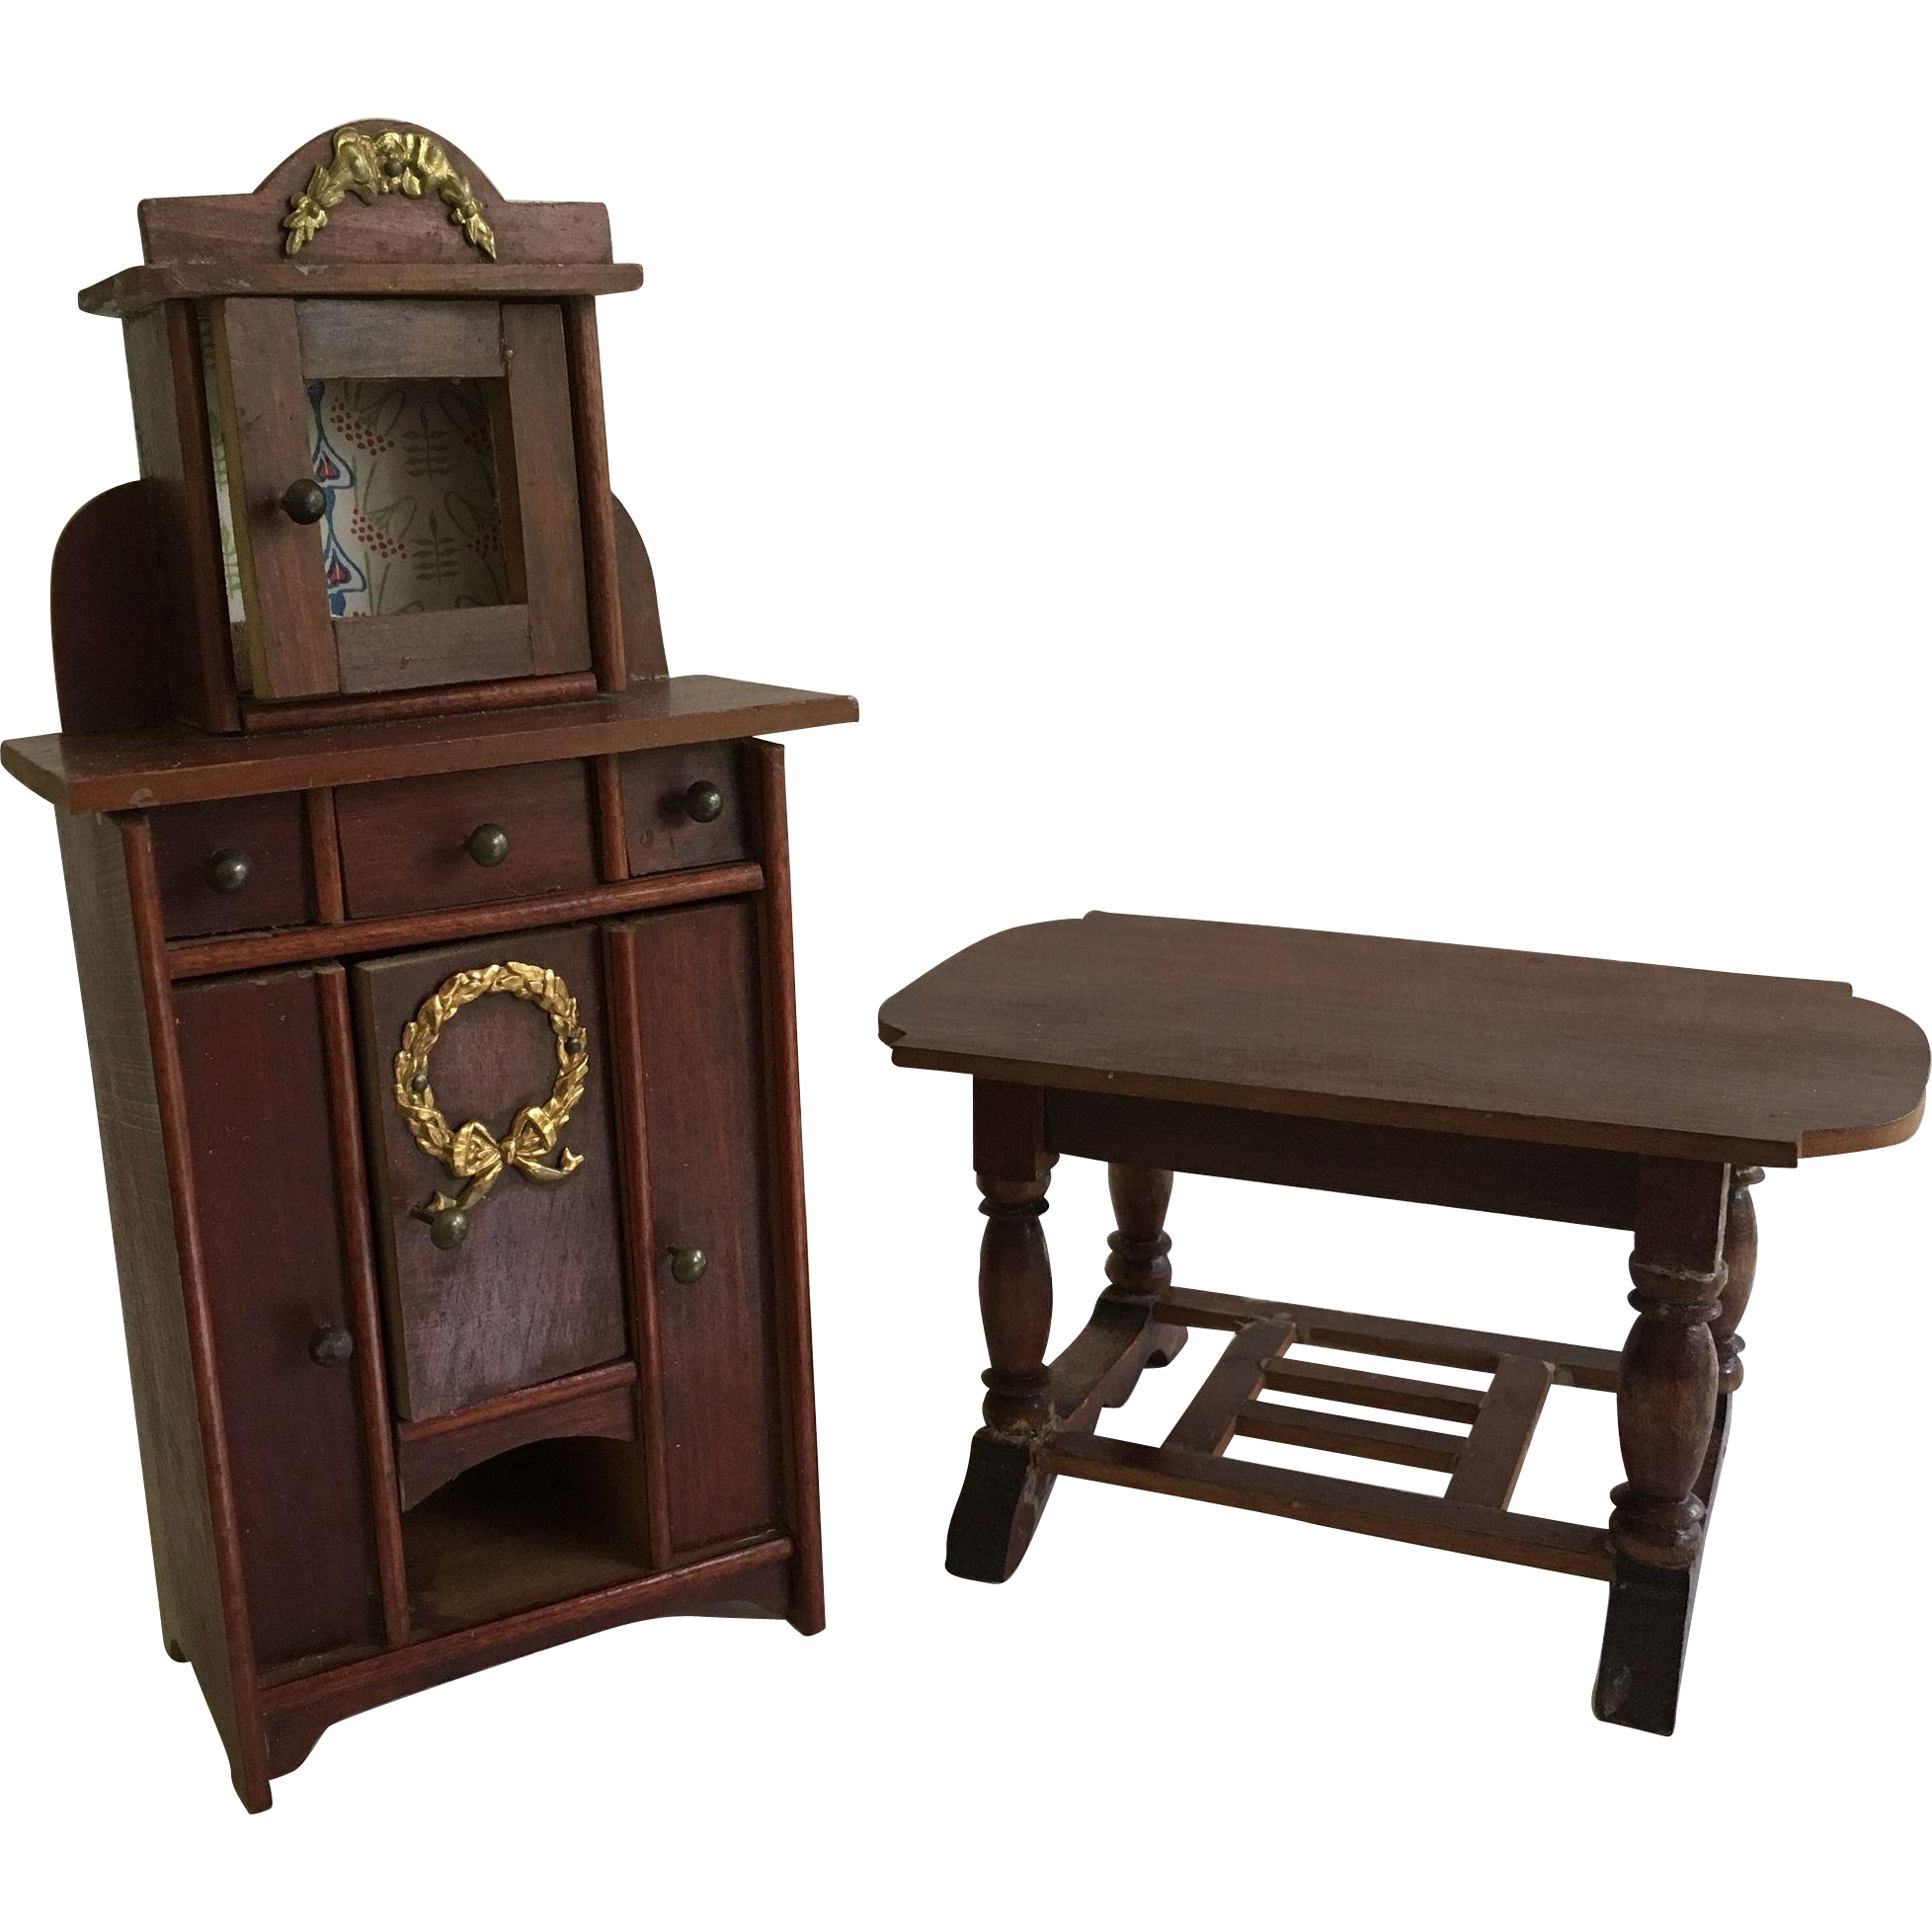 Beautiful German Dollhouse Furniture Ca. 1900-1920